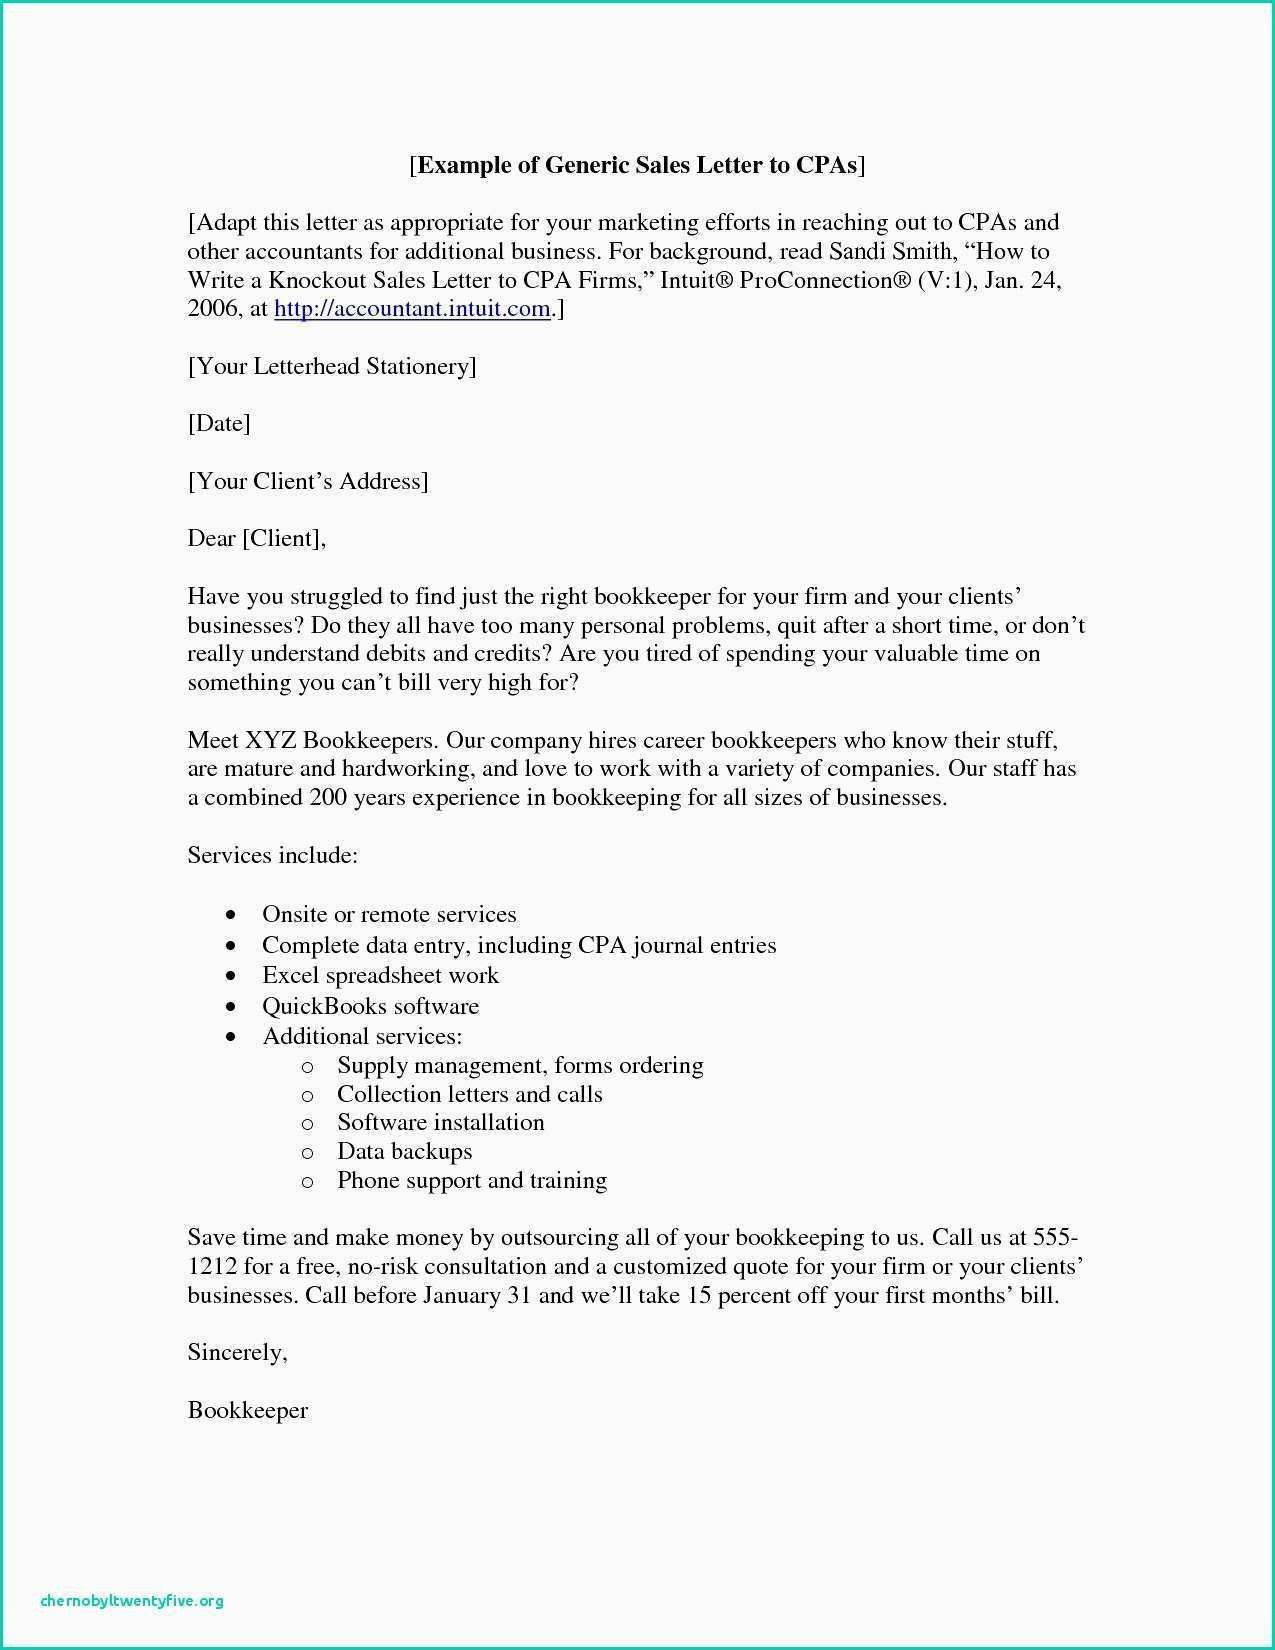 005 Stupendou Real Estate Marketing Letter Template Image  TemplatesFull